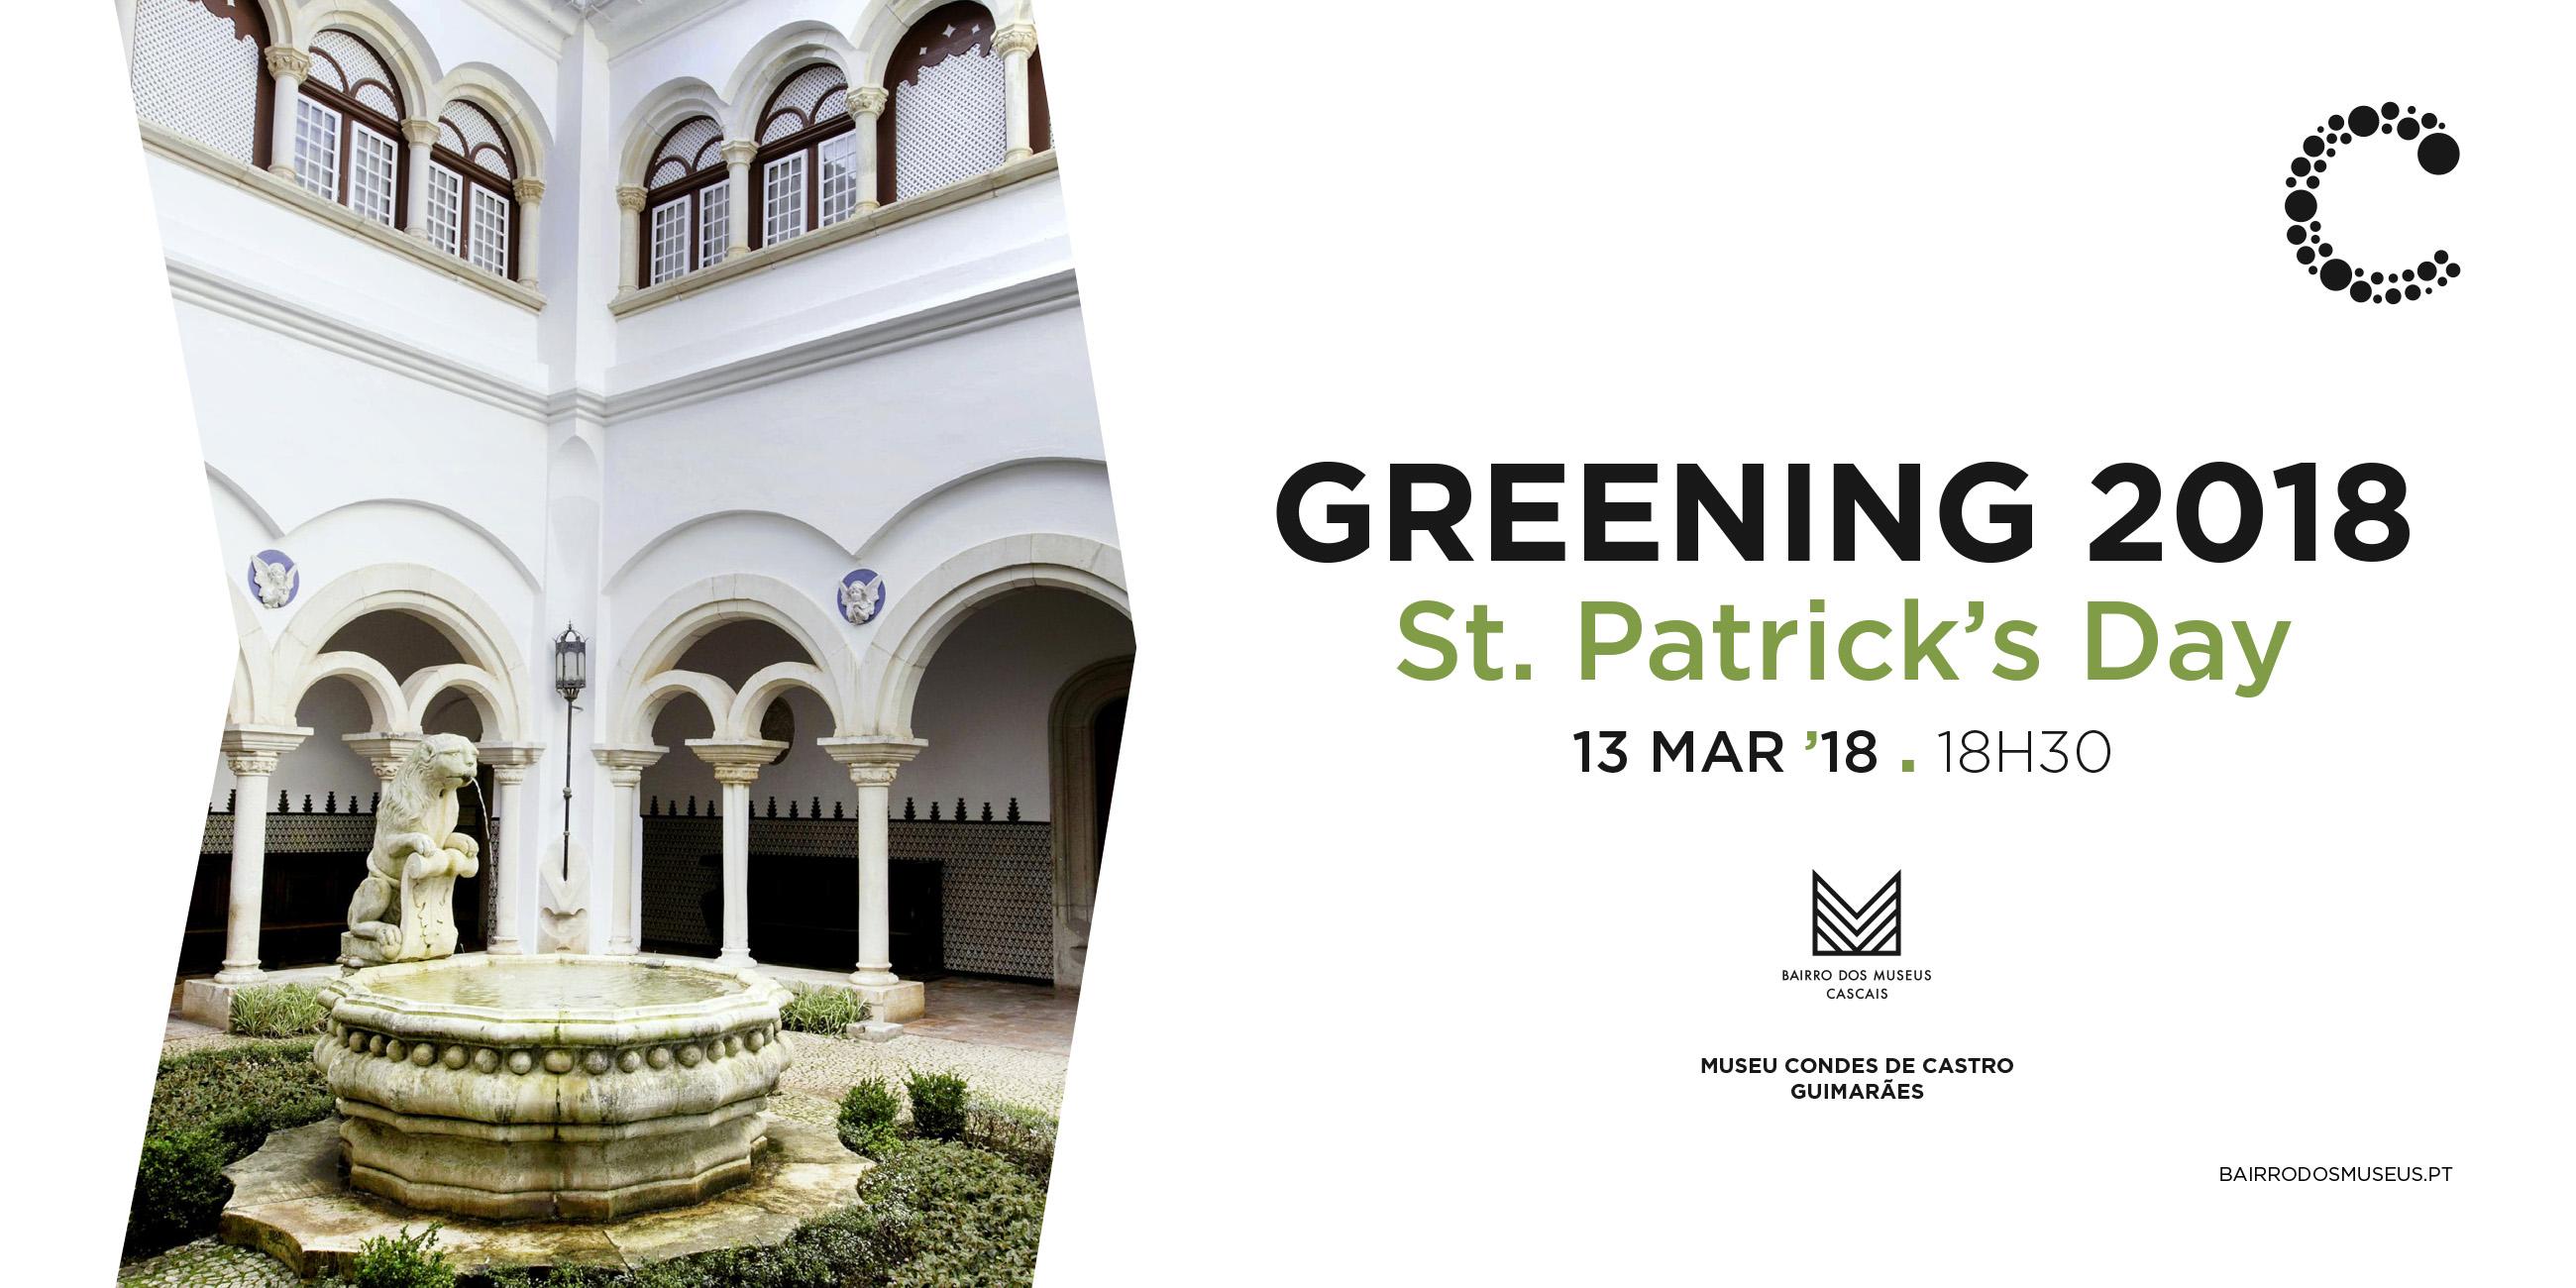 Greening 2018 | St. Patrick's Day